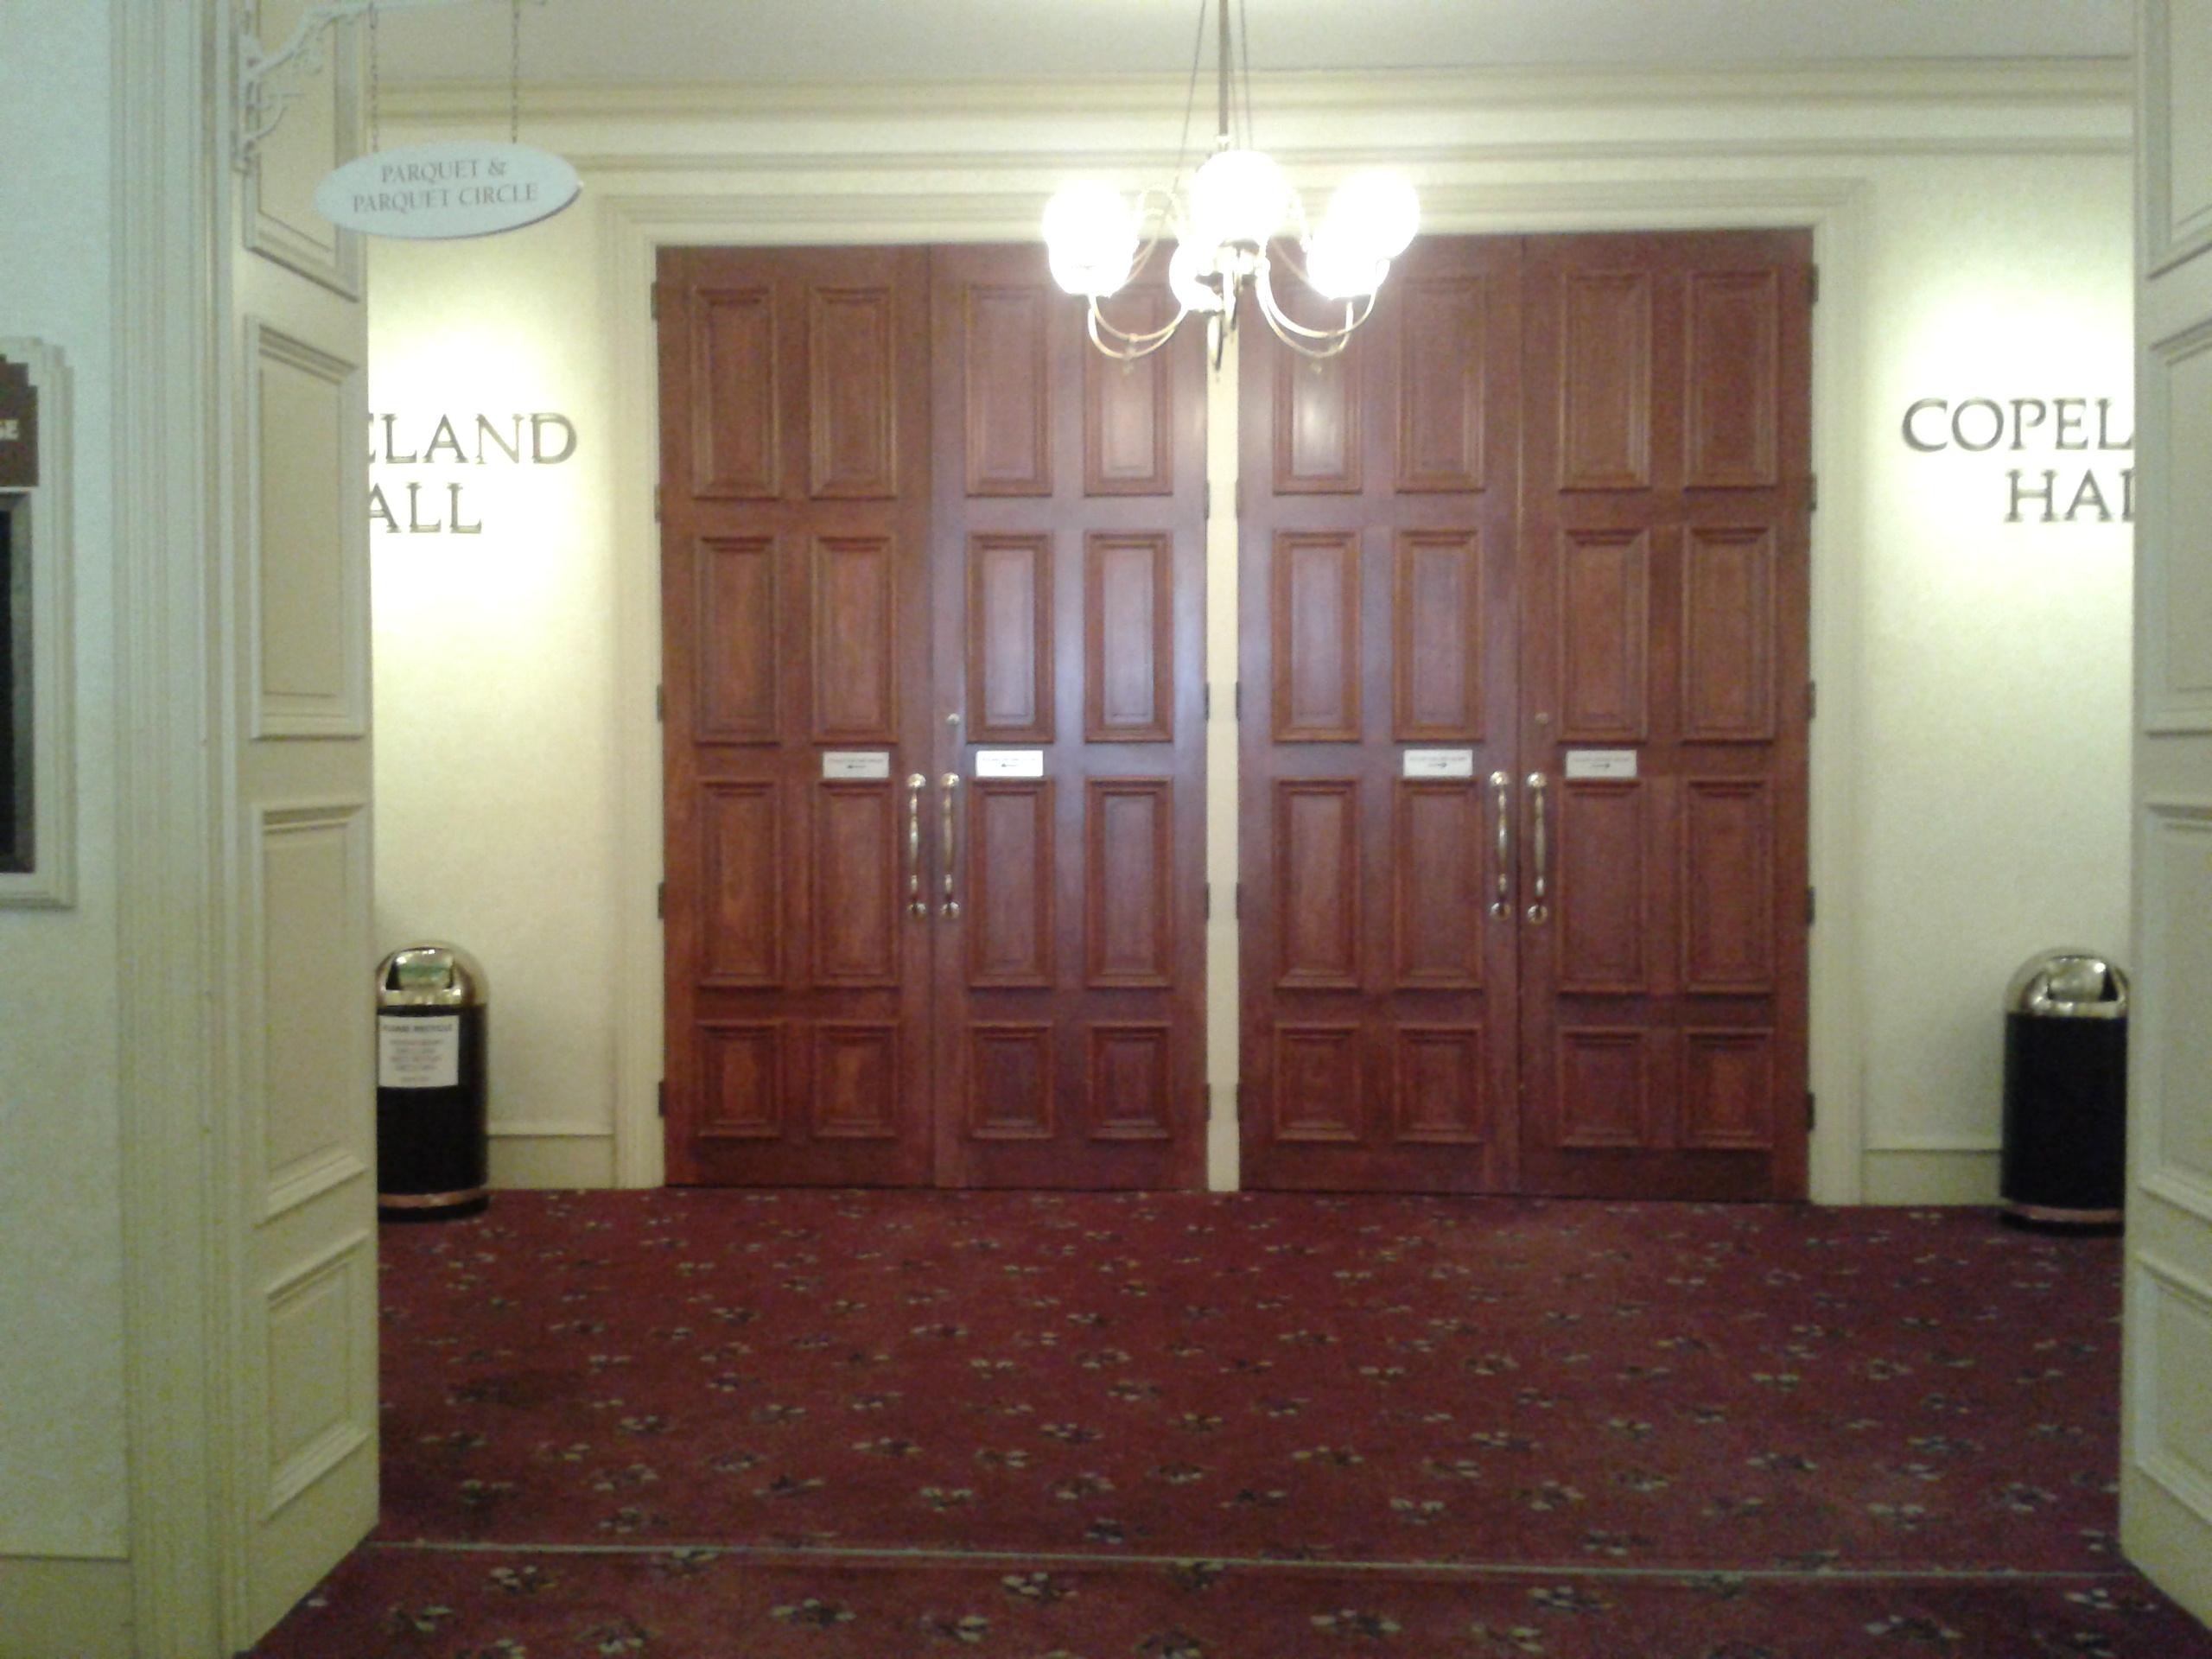 FileWilmington Grand Opera House doors to auditorium.jpg & File:Wilmington Grand Opera House doors to auditorium.jpg ...